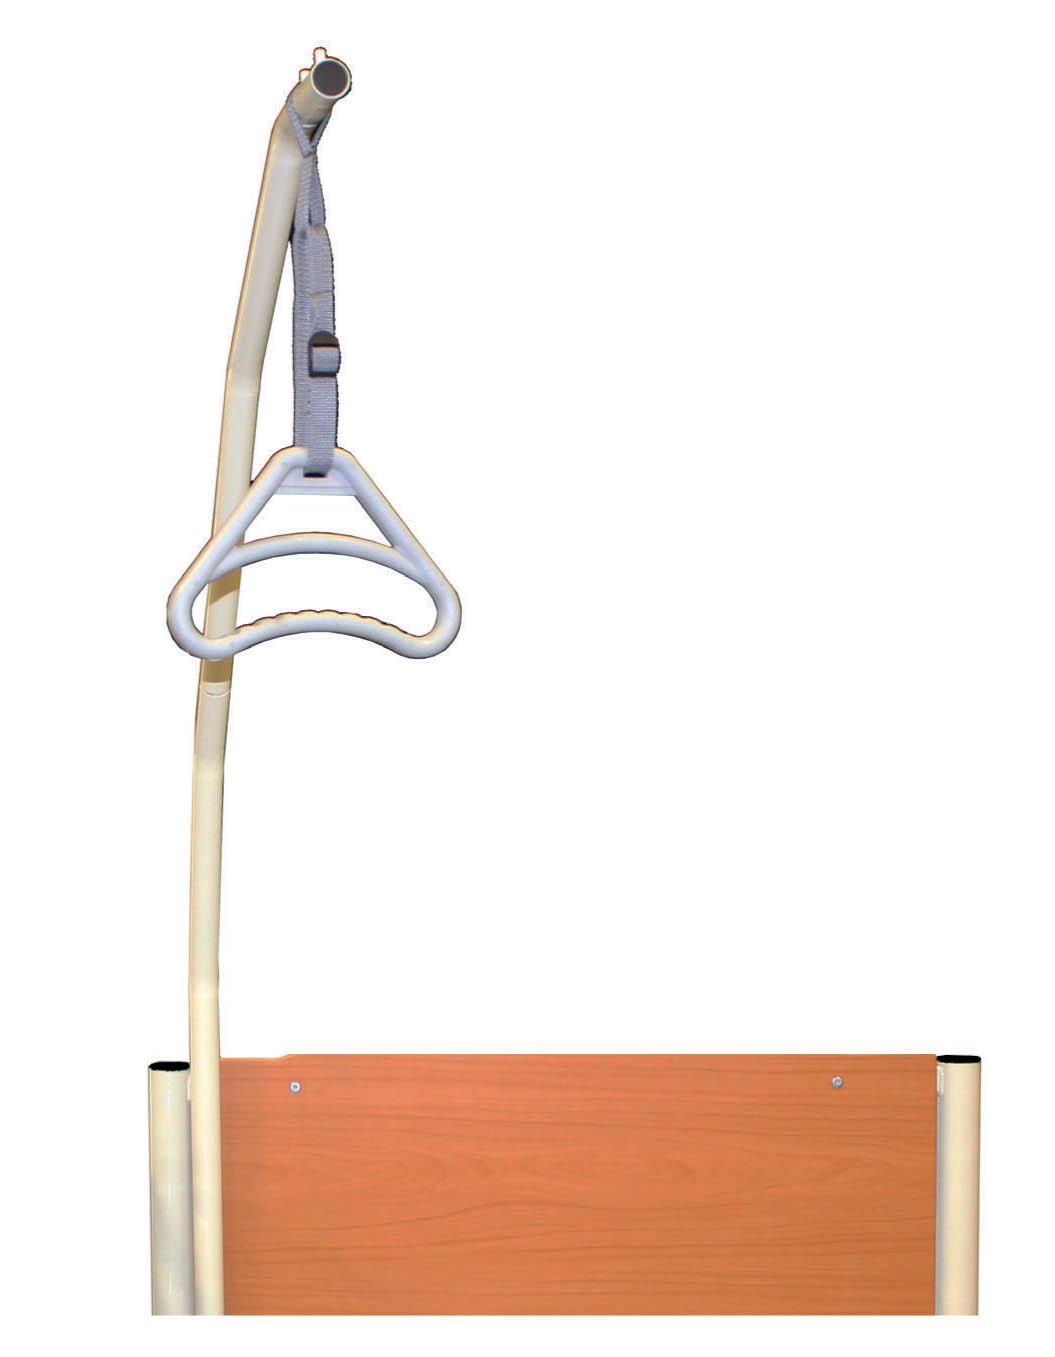 Lifting Pole